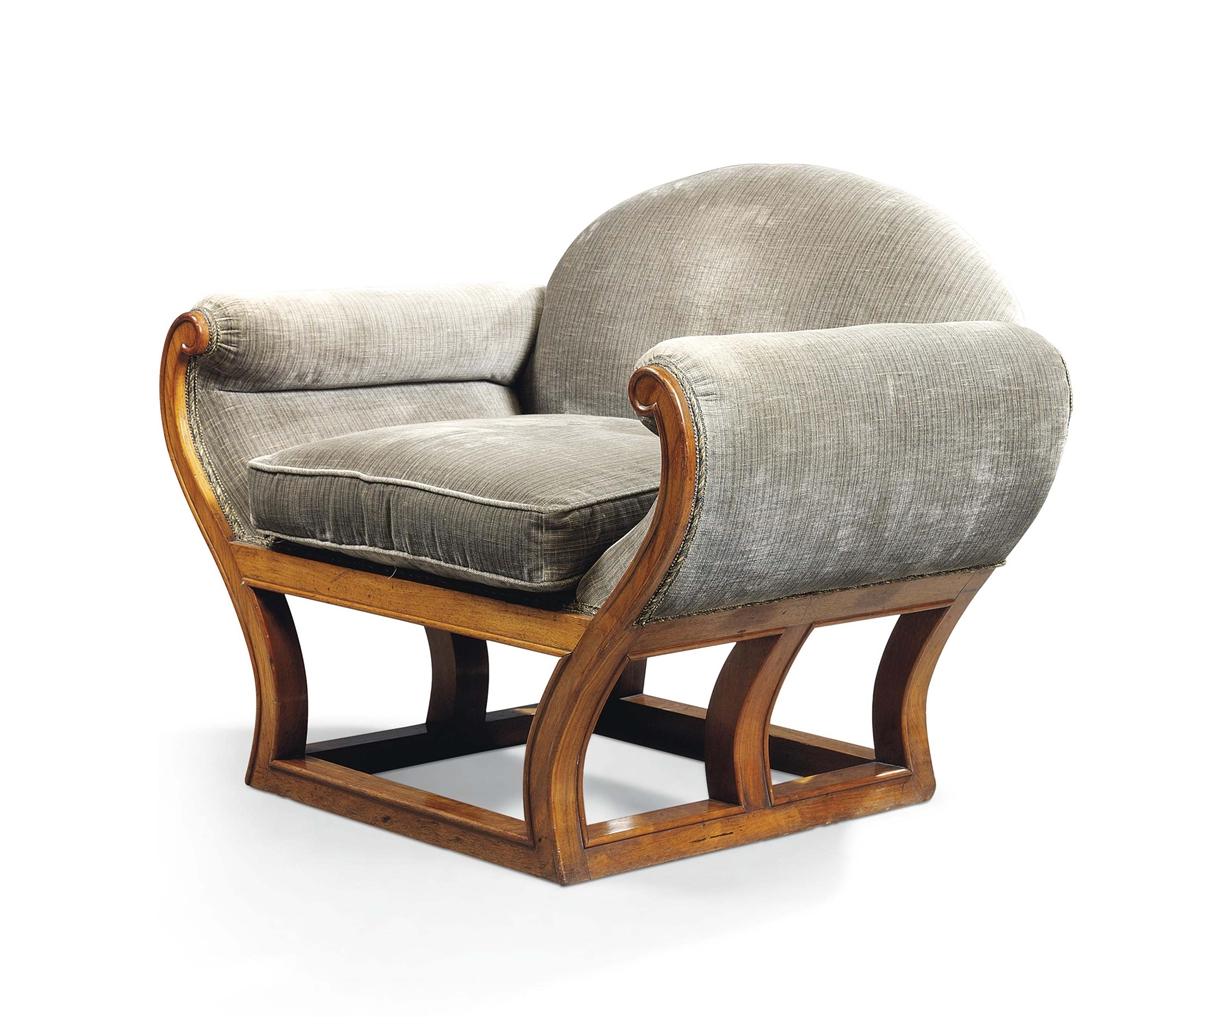 Frank brangwyn 1857 1956 armchair circa 1930 design for Chair design 1930